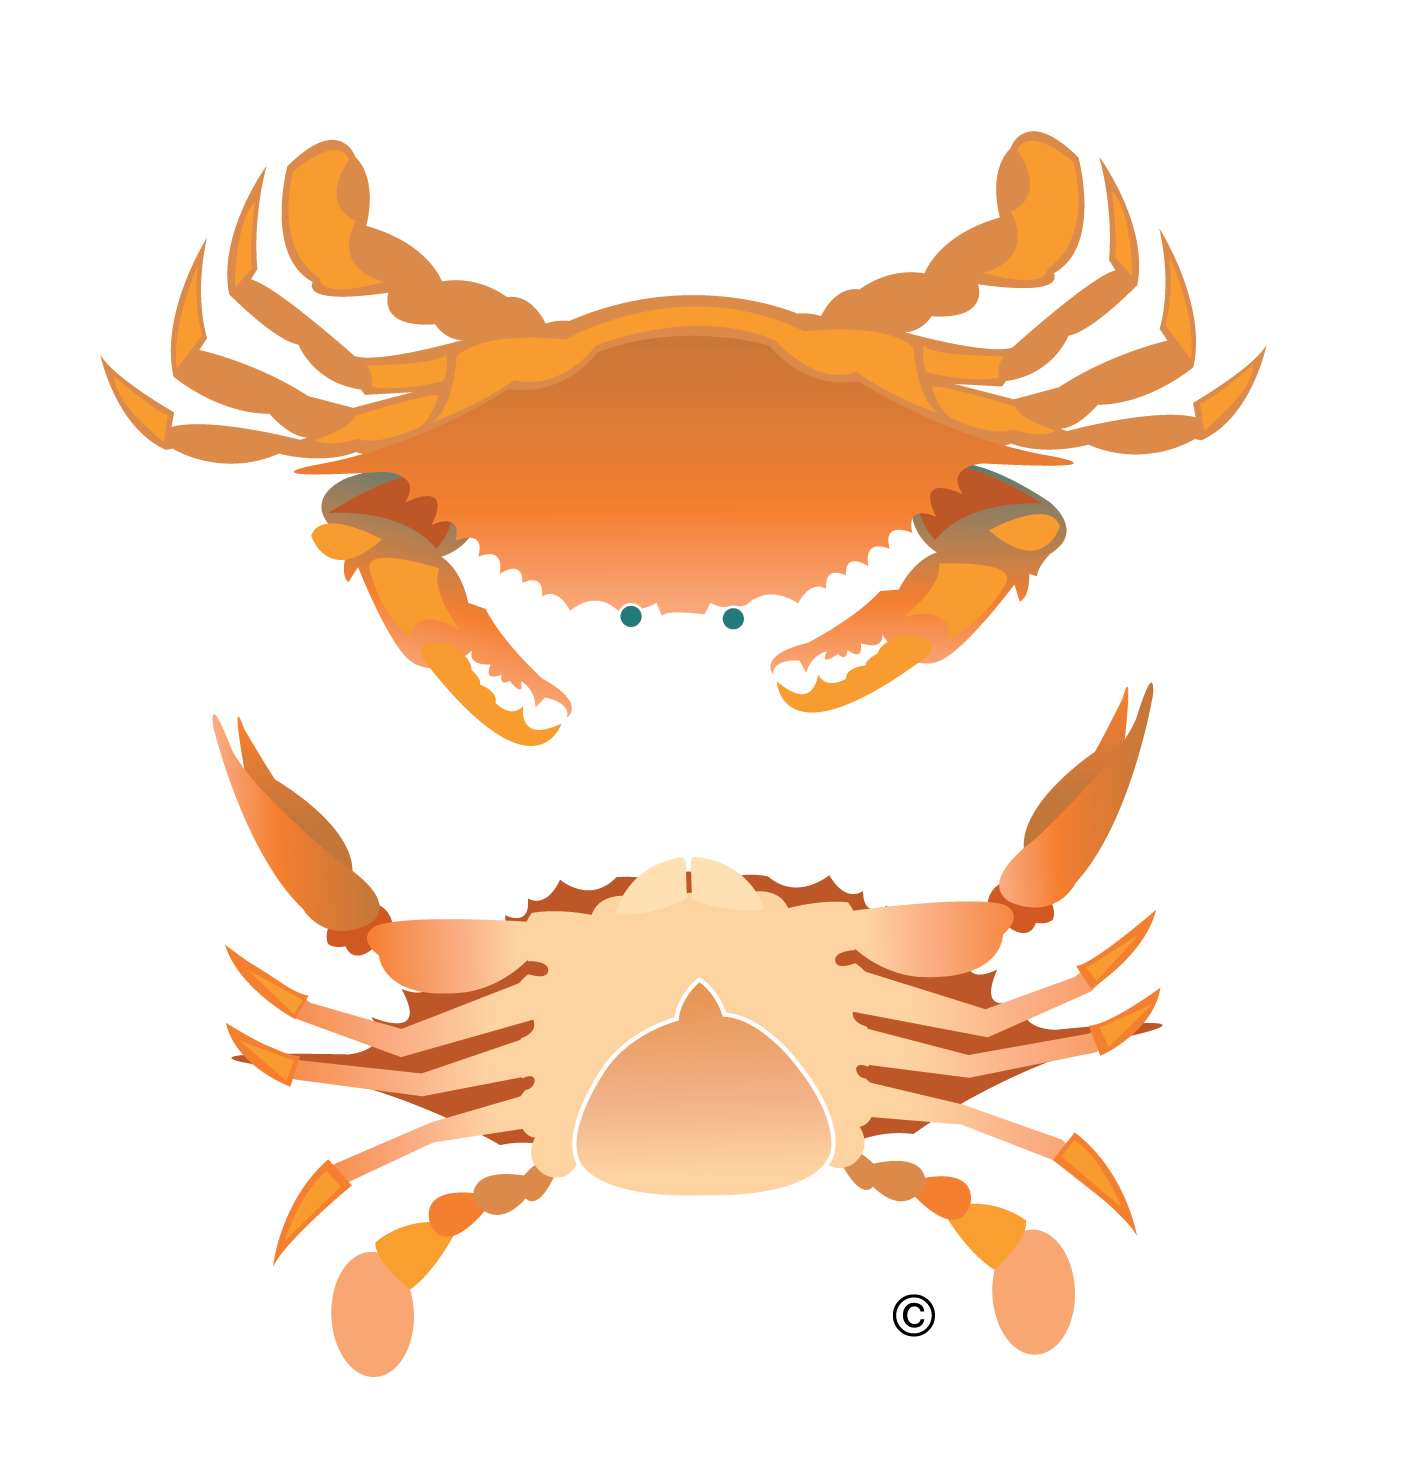 Crabs clipart orange crab. Clip art new orleans